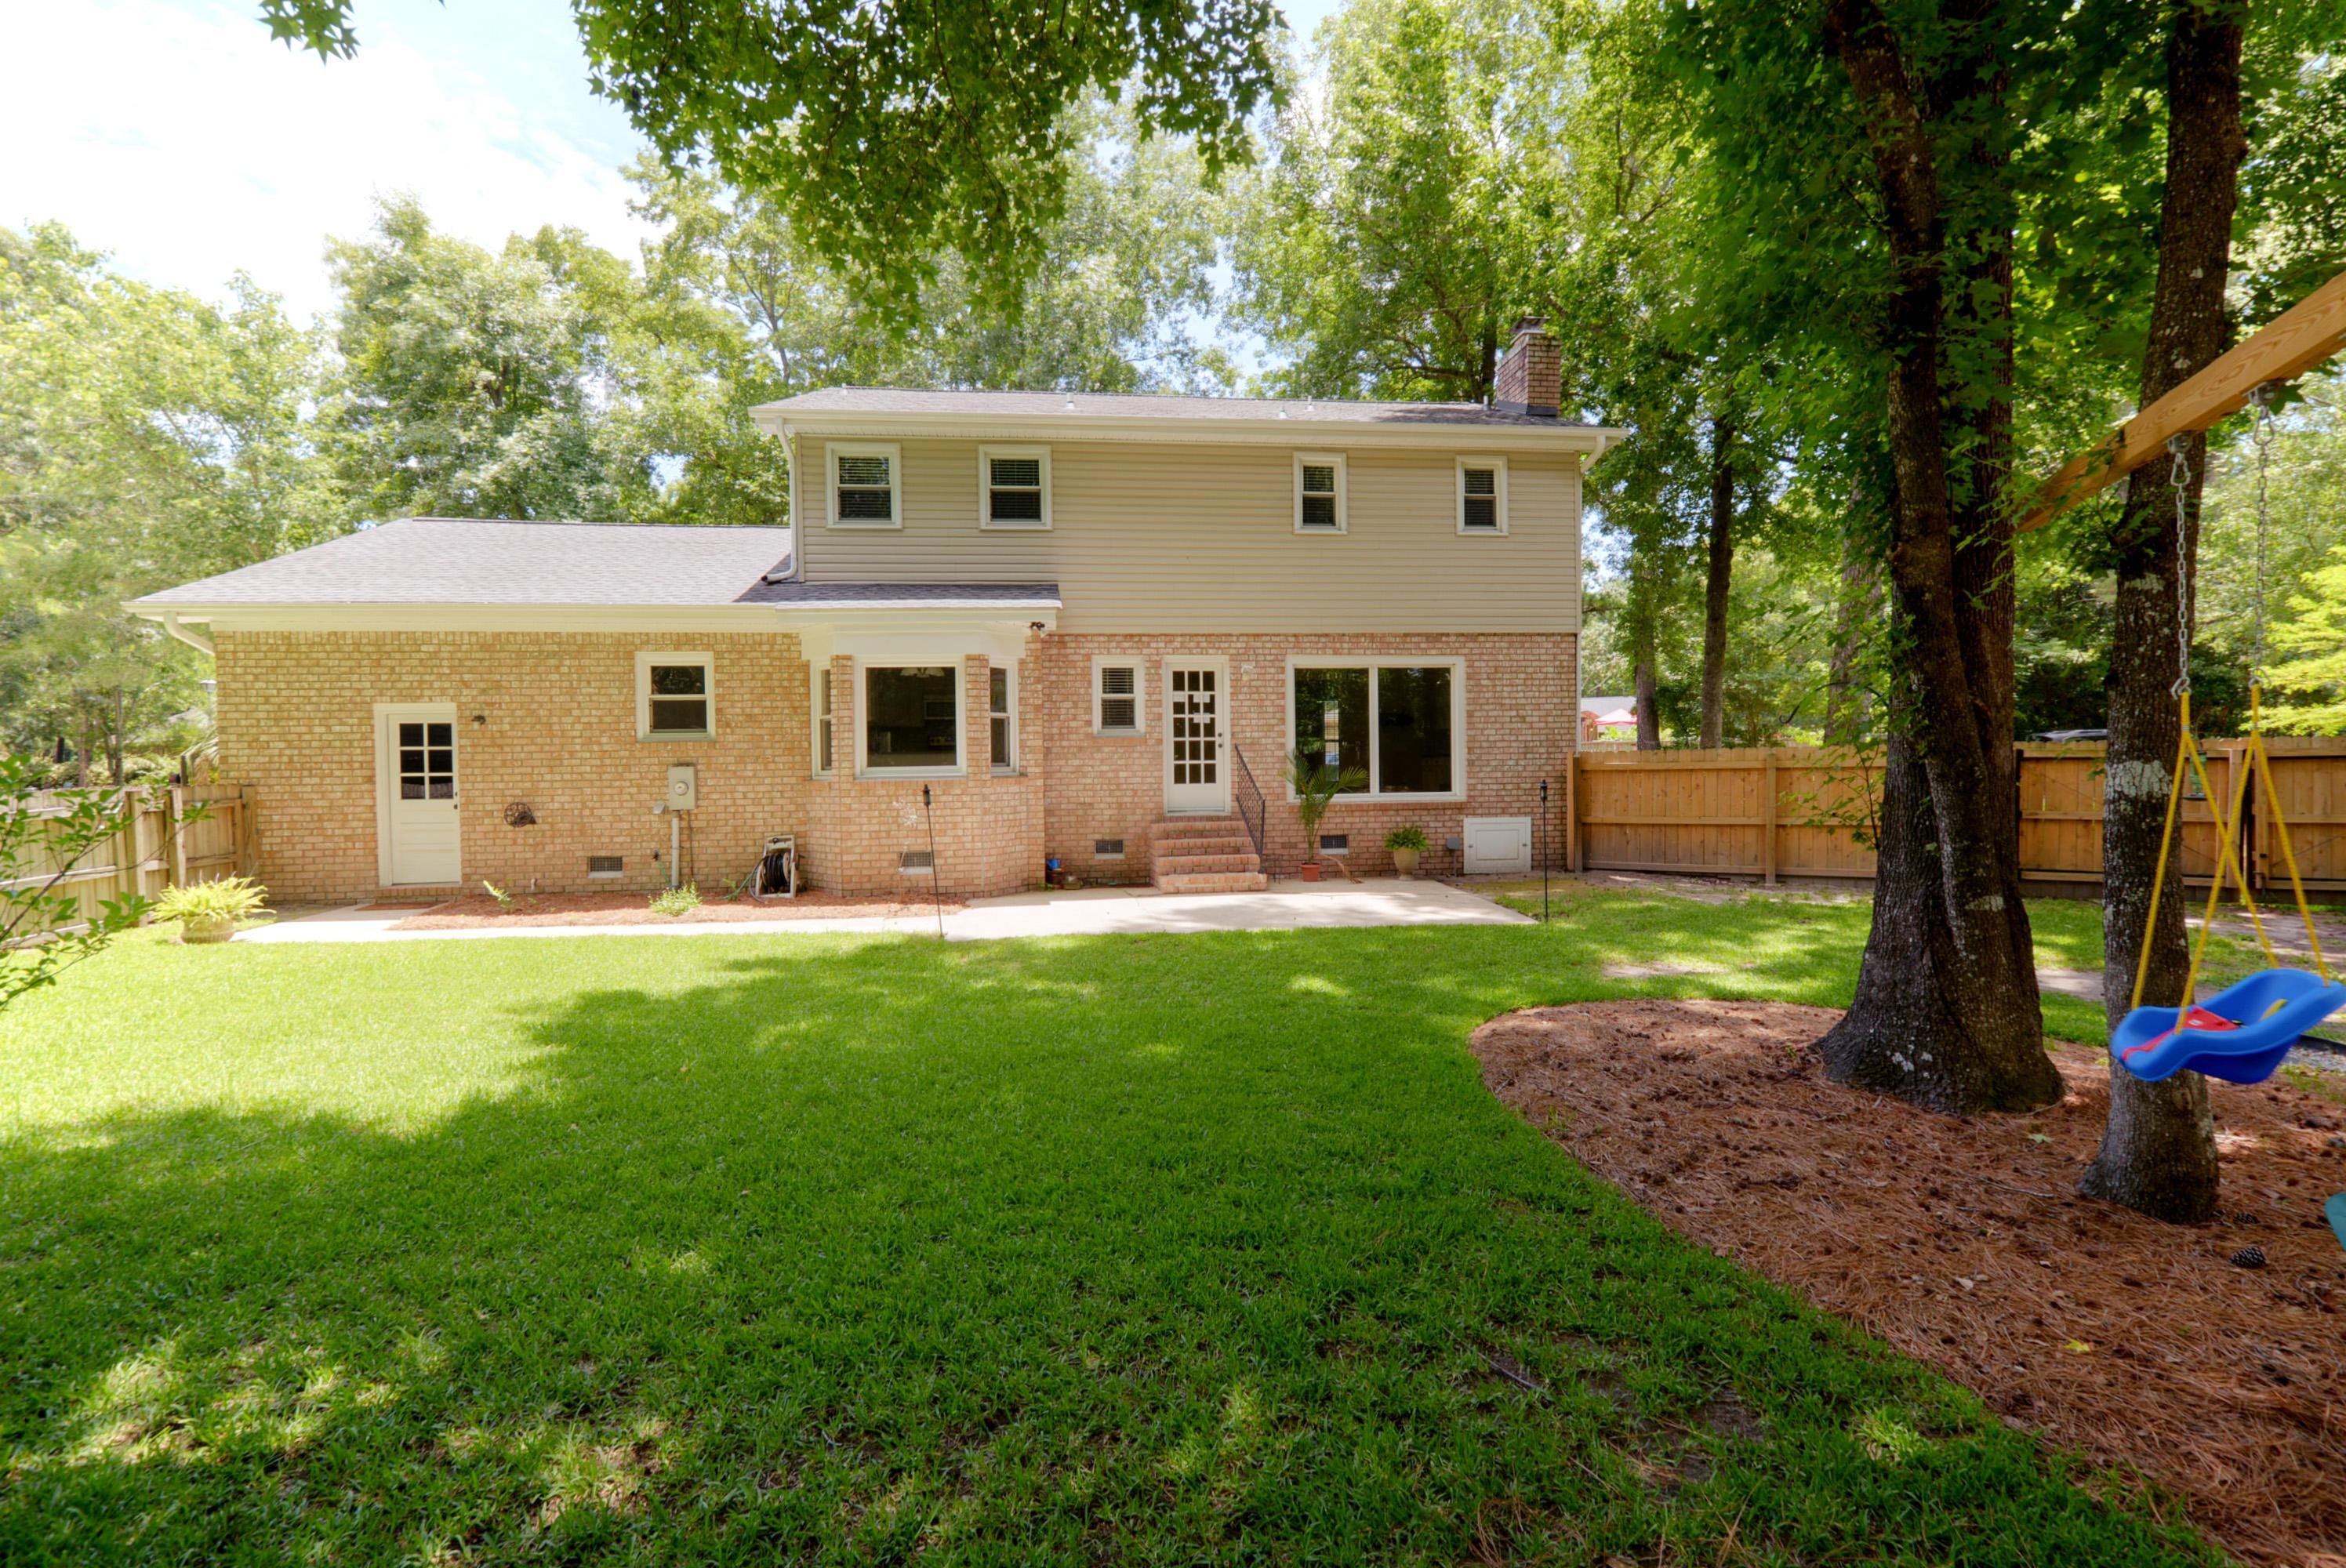 Snee Farm Homes For Sale - 1048 Royalist Rd, Mount Pleasant, SC - 29